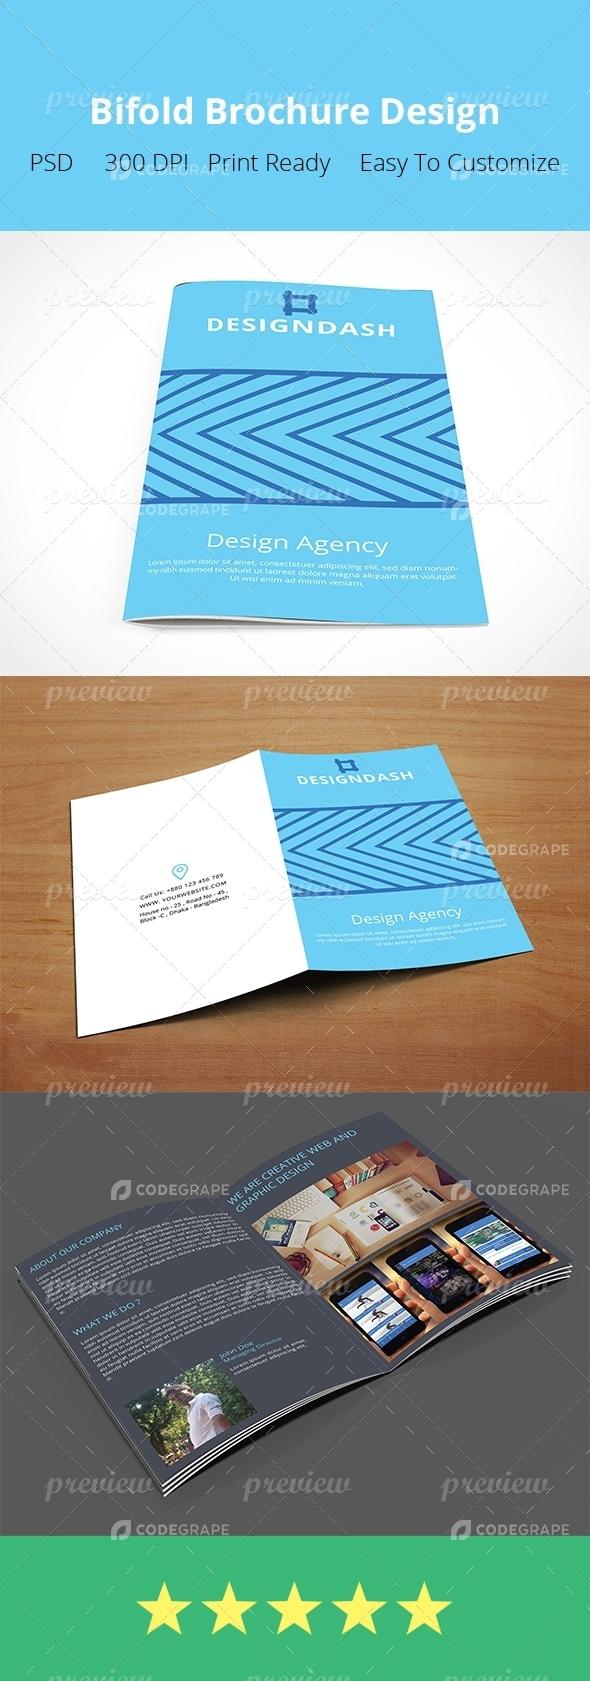 Design Bifold Brochure